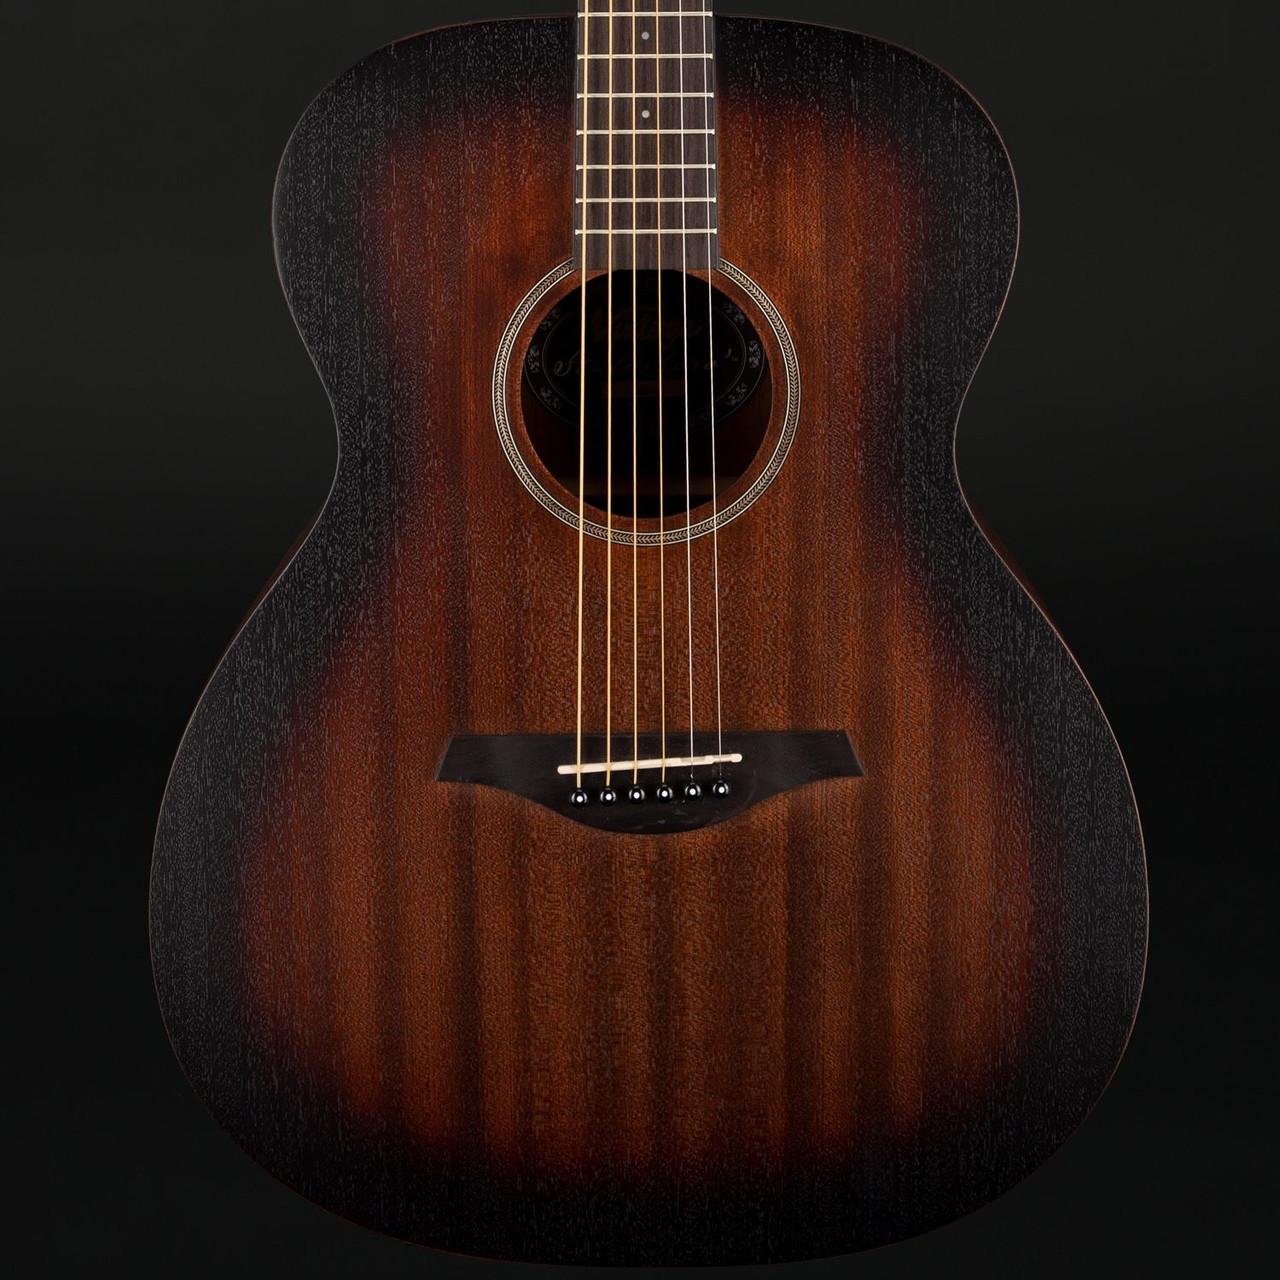 Whisky Sour Vintage Paul Brett Statesboro/' Acoustic Dreadnought Guitar